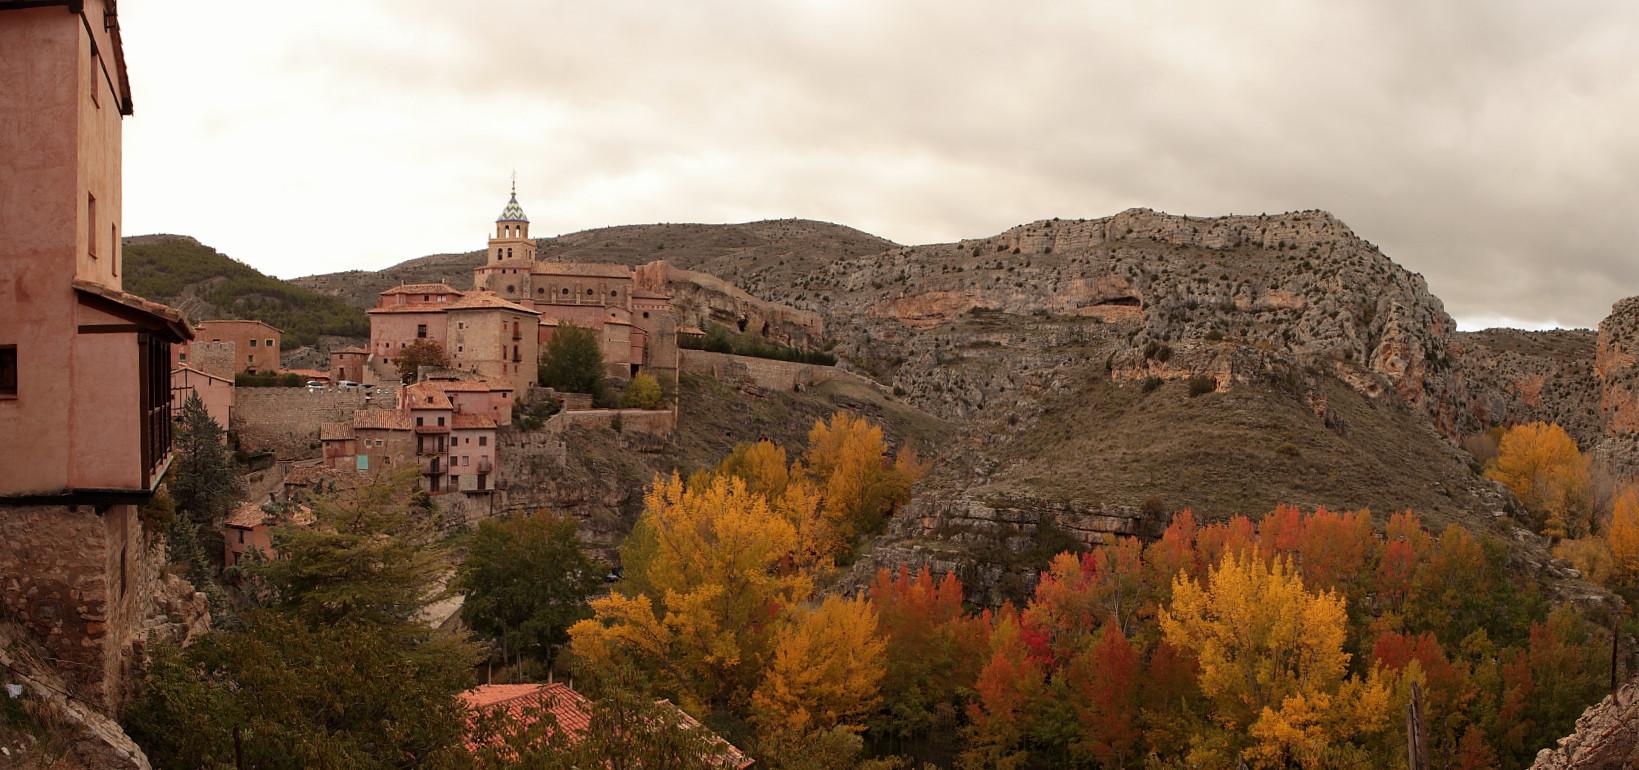 Albarracin en otoño